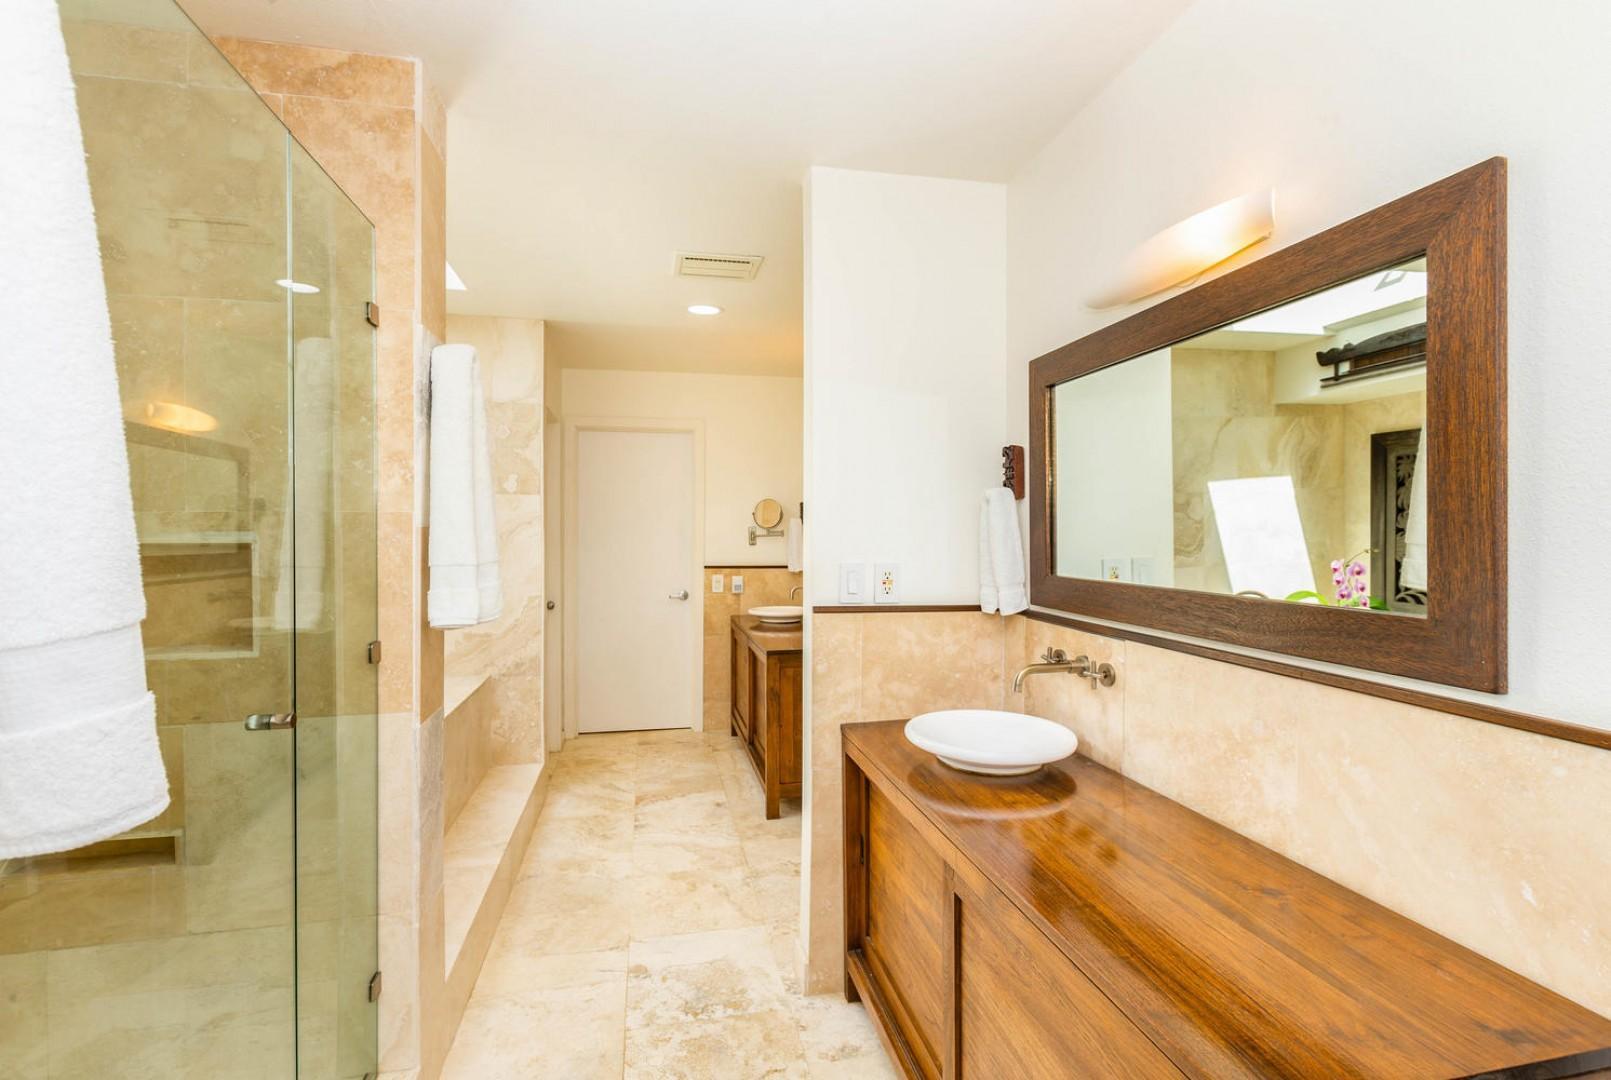 Master Suite Bathroom with Double Vanity